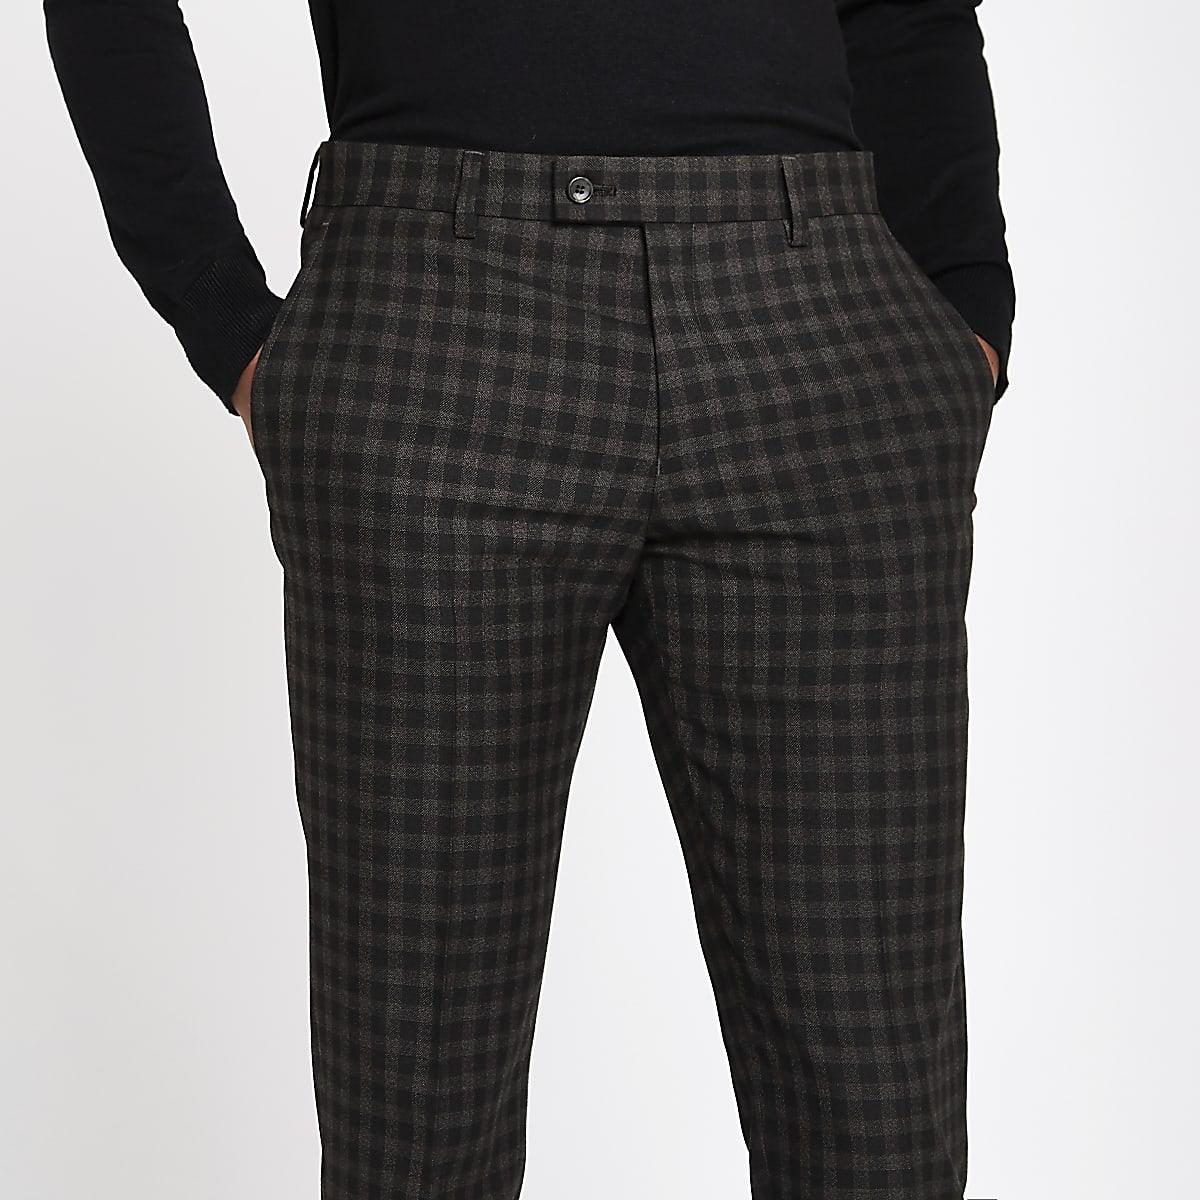 dee5c09916ea6 Brown shadow check skinny fit suit trousers - Suit Trousers - Suits - men